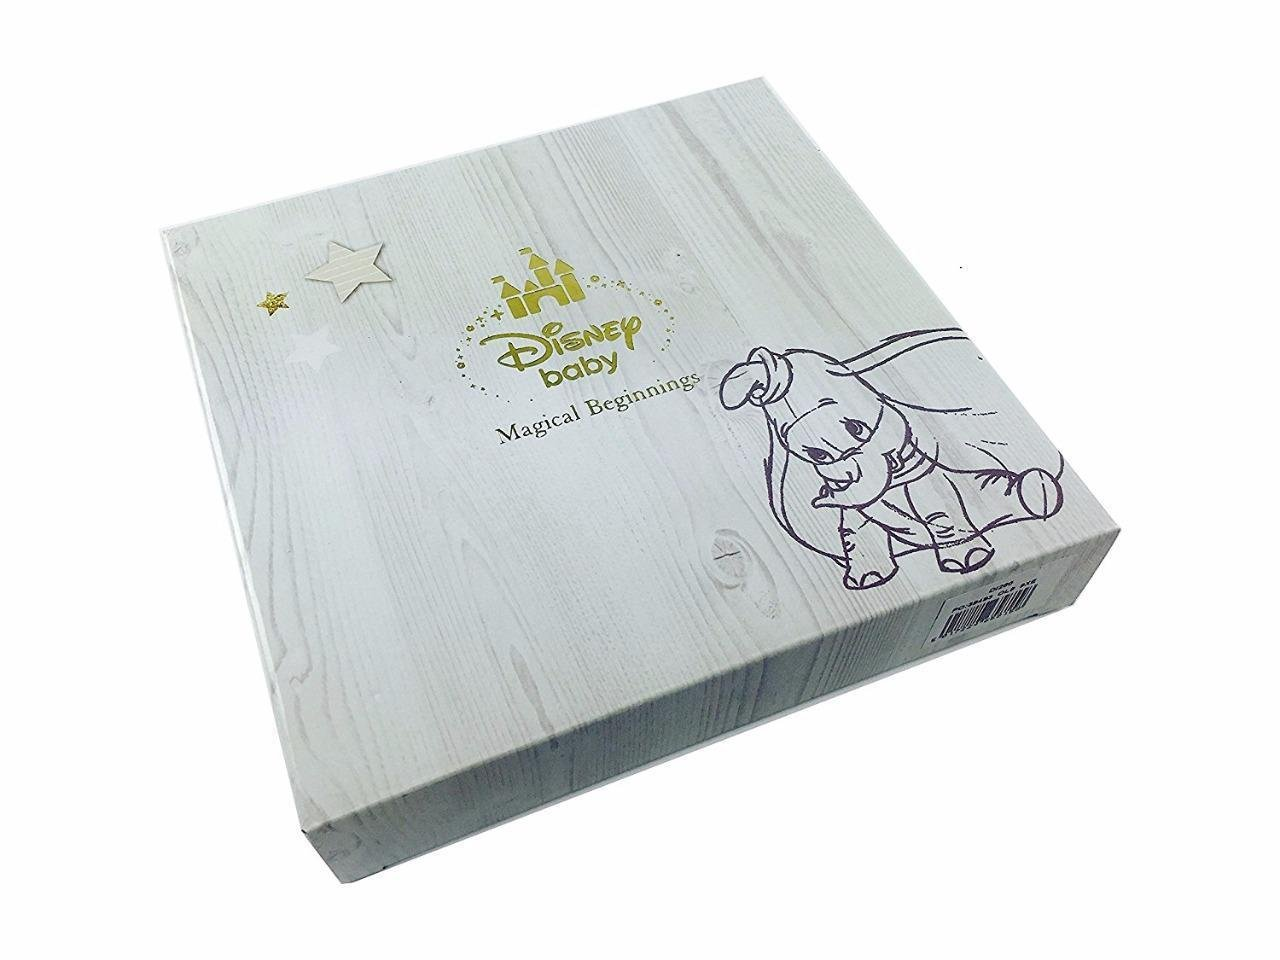 No Personalisation ukgiftstoreonline Disney Baby Photo Album Mickey Mouse Boxed